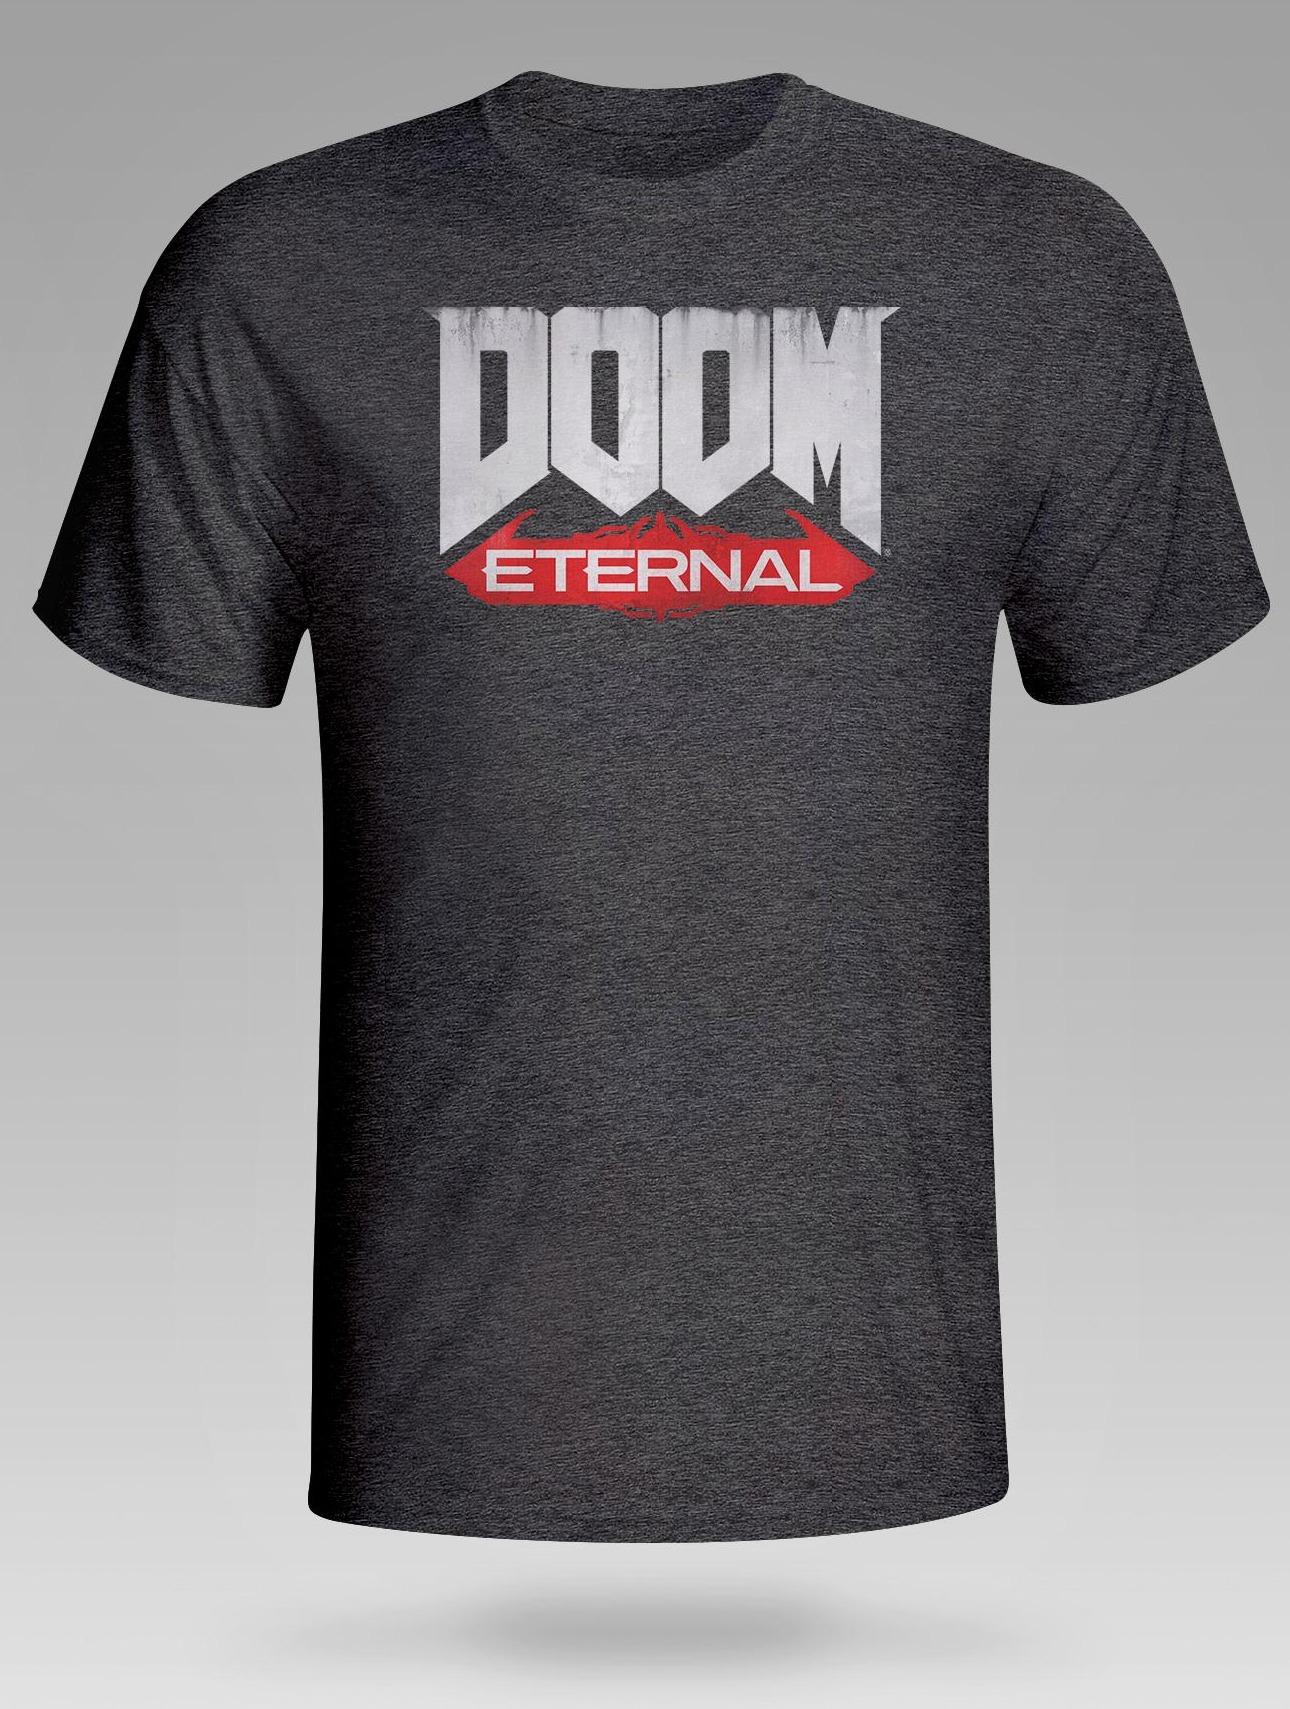 Tričko Doom: Eternal - Logo, tmavě šedé (velikost S) (PC)